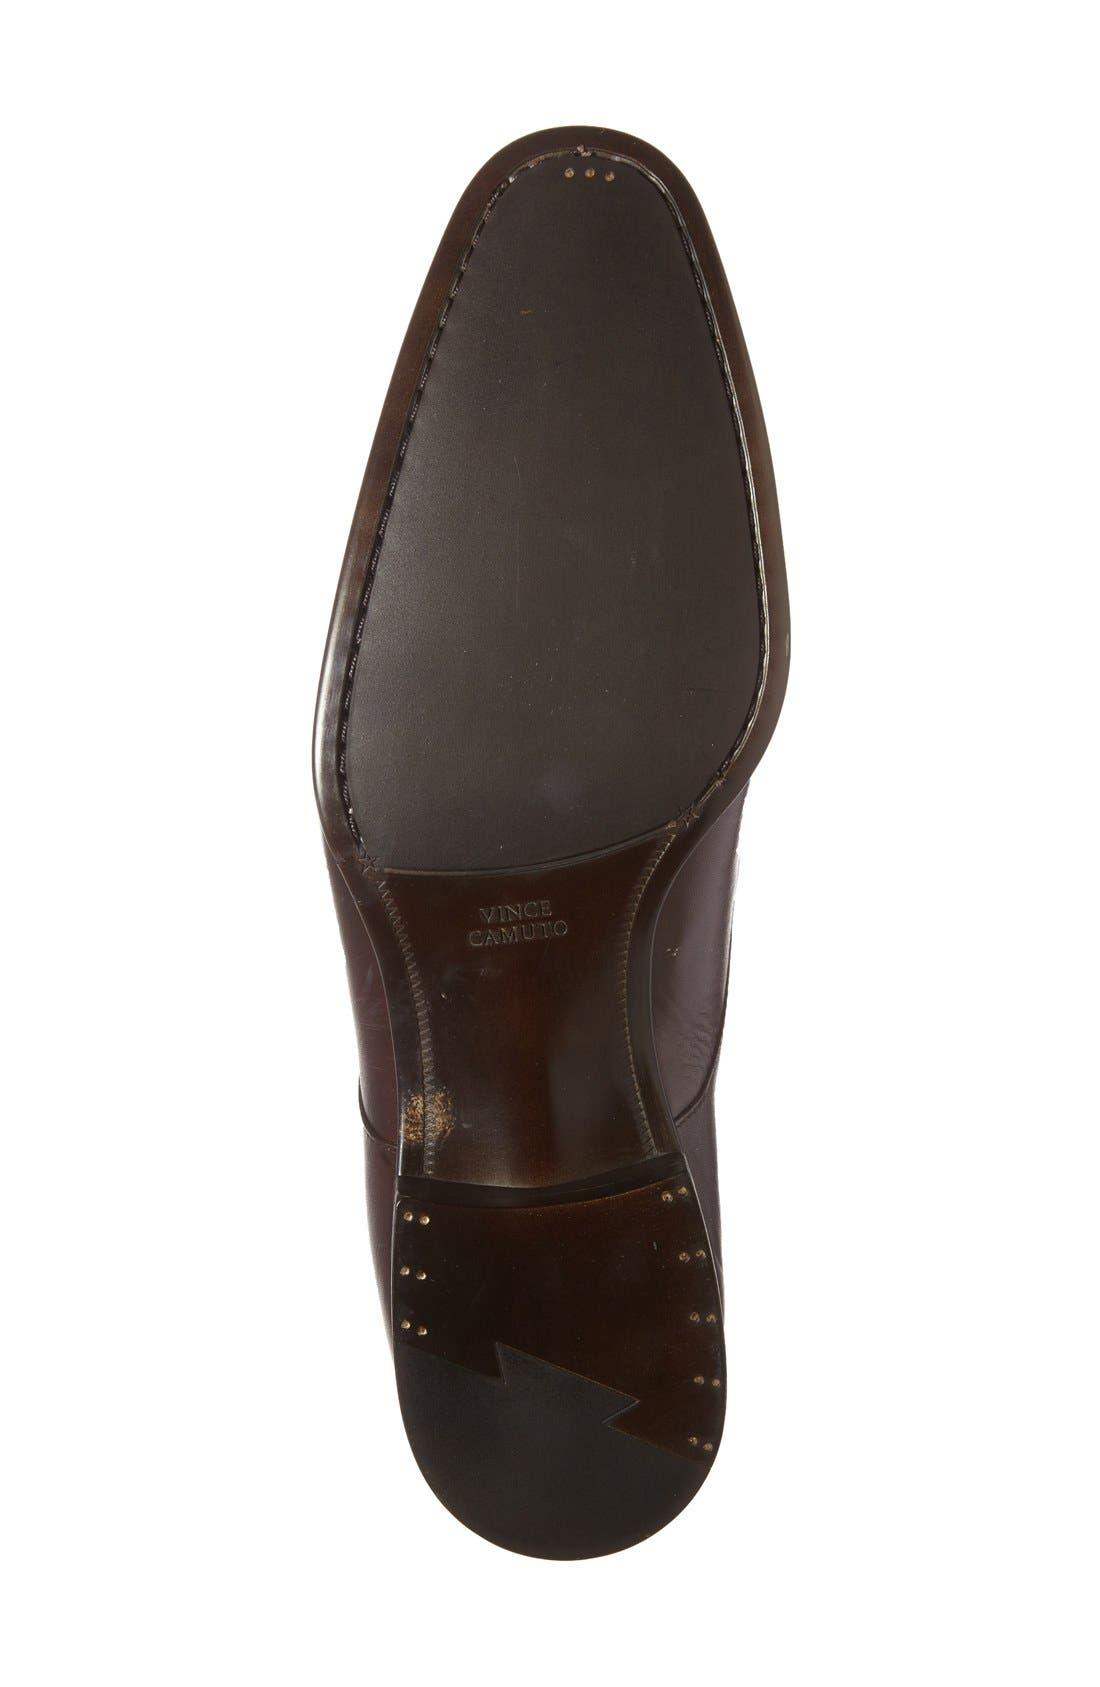 'Trifolo' Monk Strap Shoe,                             Alternate thumbnail 4, color,                             Dark Woodbury Leather